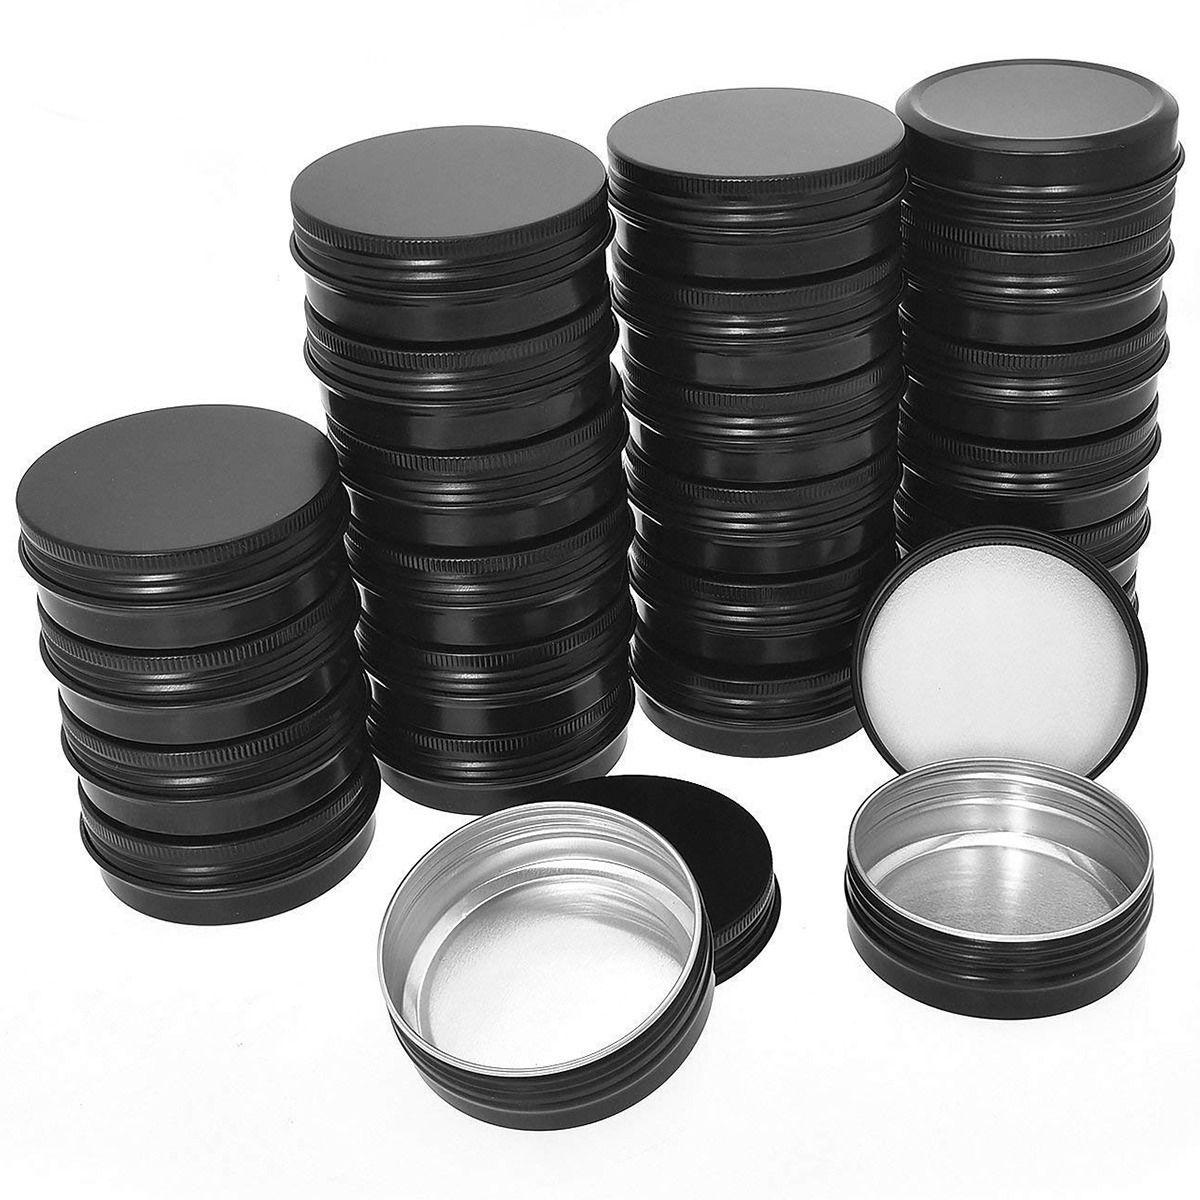 Latas de alumínio CHFL Tin - 40 pacote de 1 onça / 30G redonda de metal Tin Container parafuso superior Latas Amostra Cosmetic Containers Vela Viagem T T200104